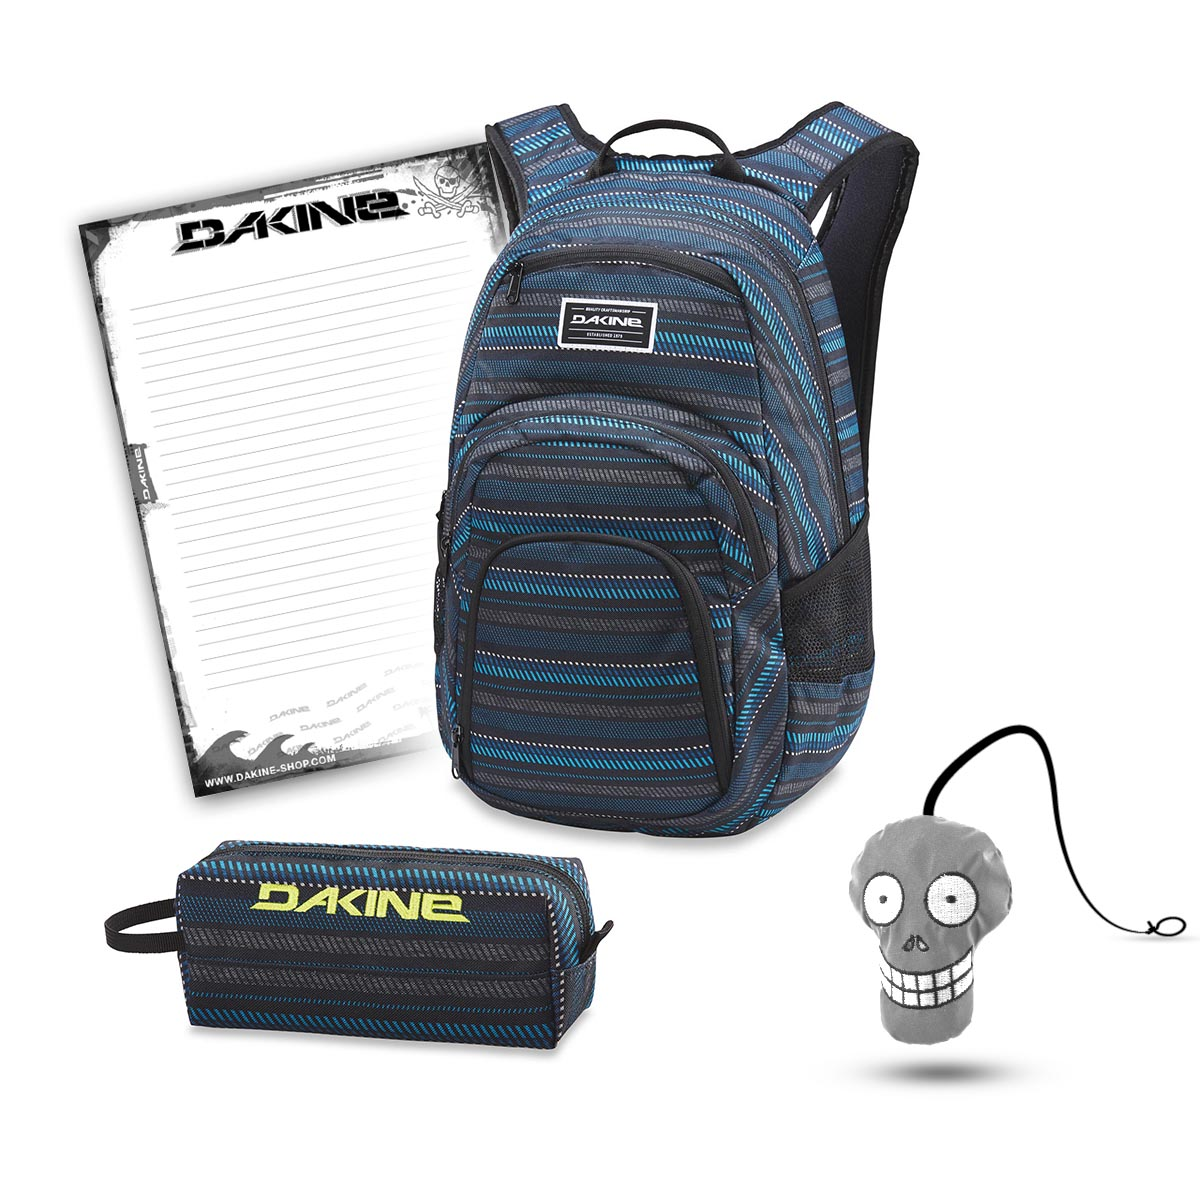 aa9951e7b03 Dakine Campus 25L + Accessory Case + Harry + Notepad School Set Ventana | Dakine  Campus 25L | School Sets | School | DAKINE Shop.de: Dakine-Rucksack, ...